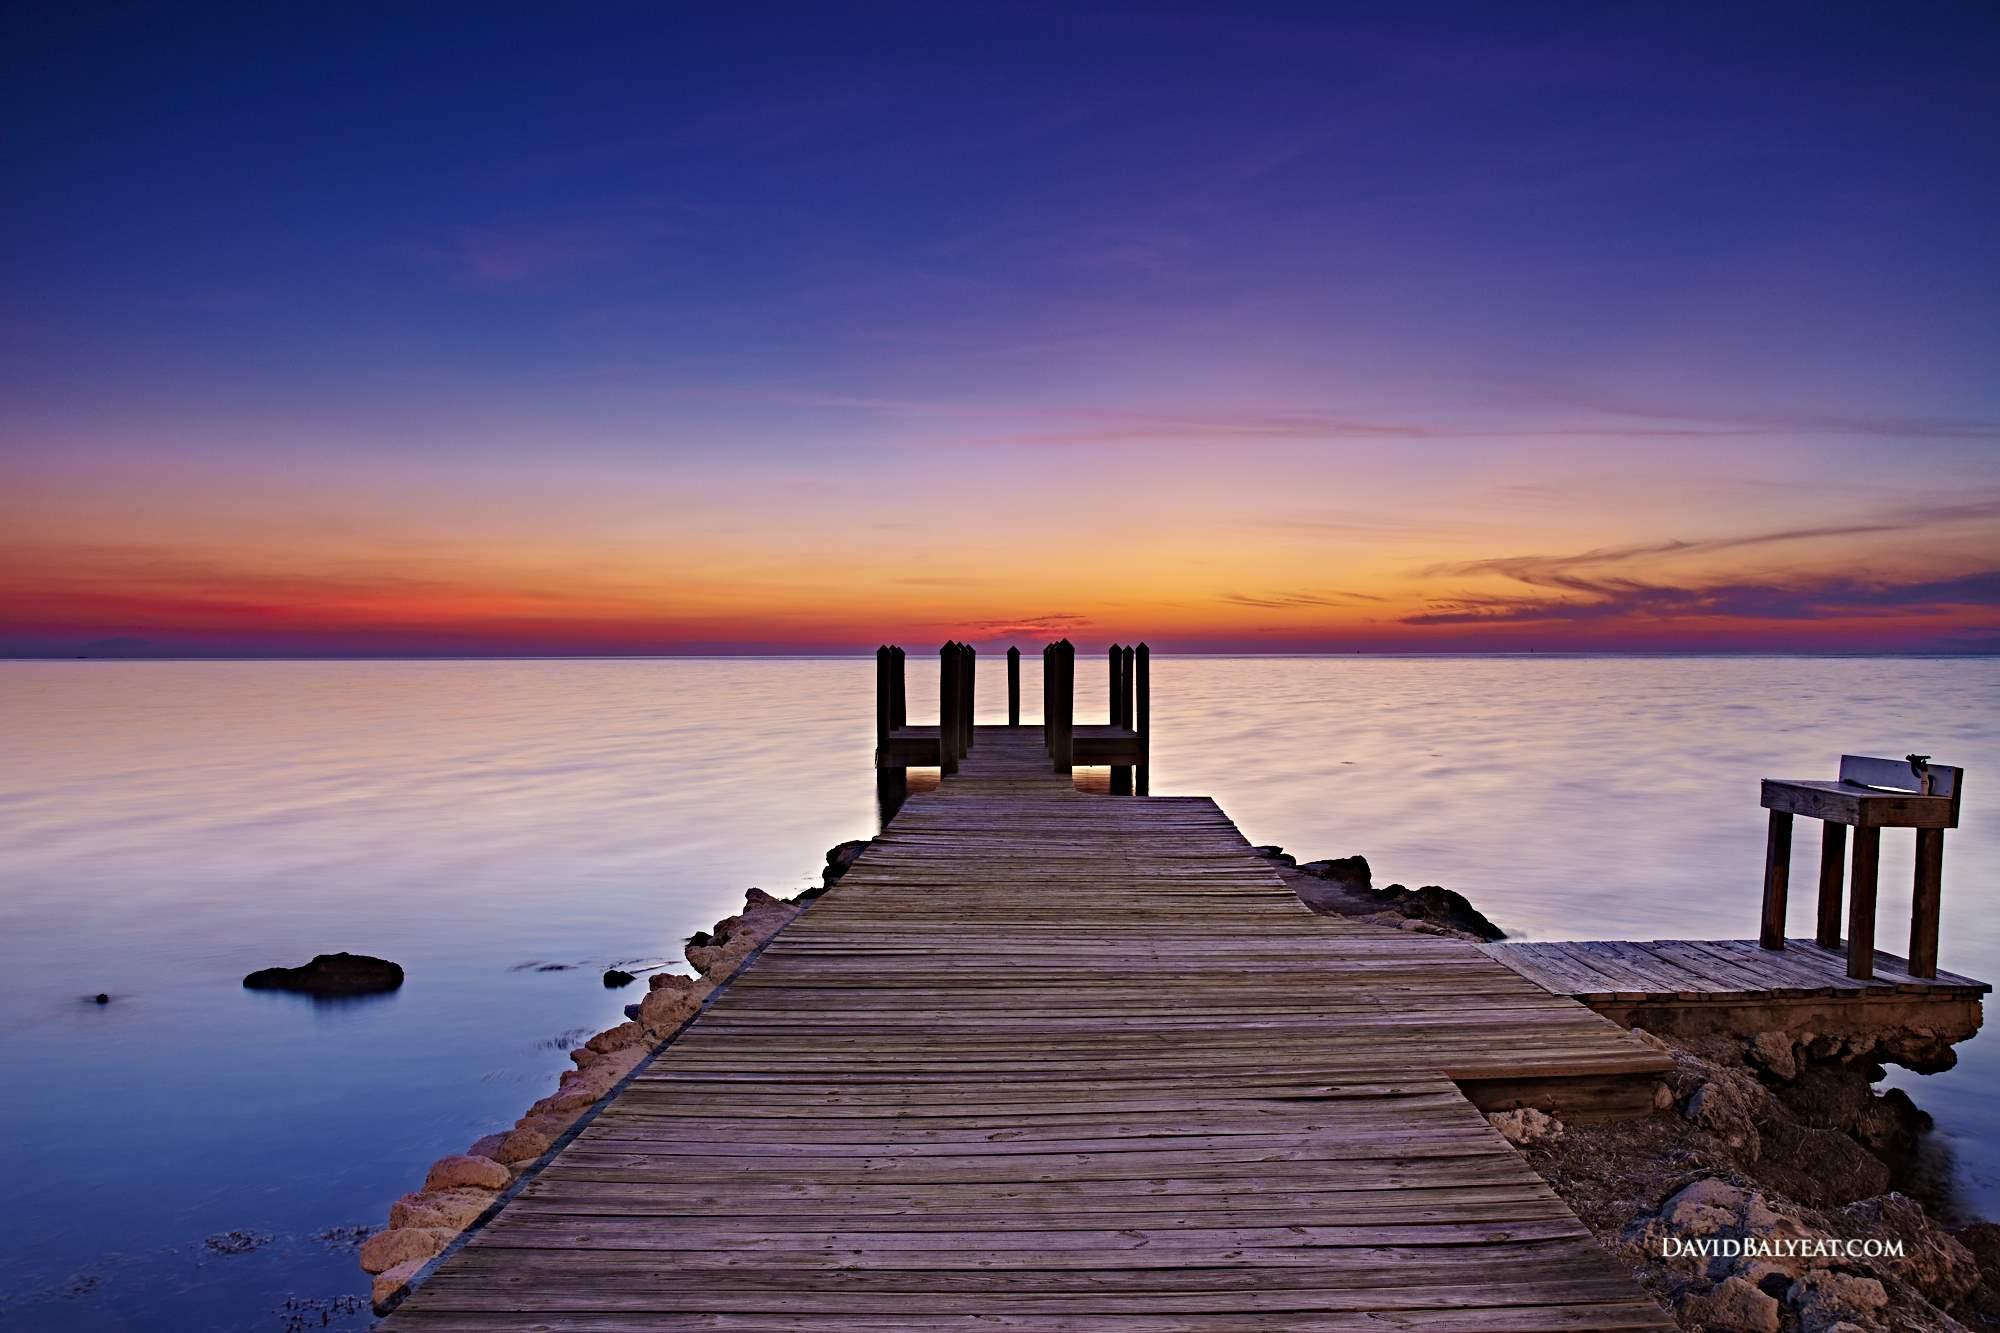 Florida Keys sunset jetty infinity high-defintion HD professional photography